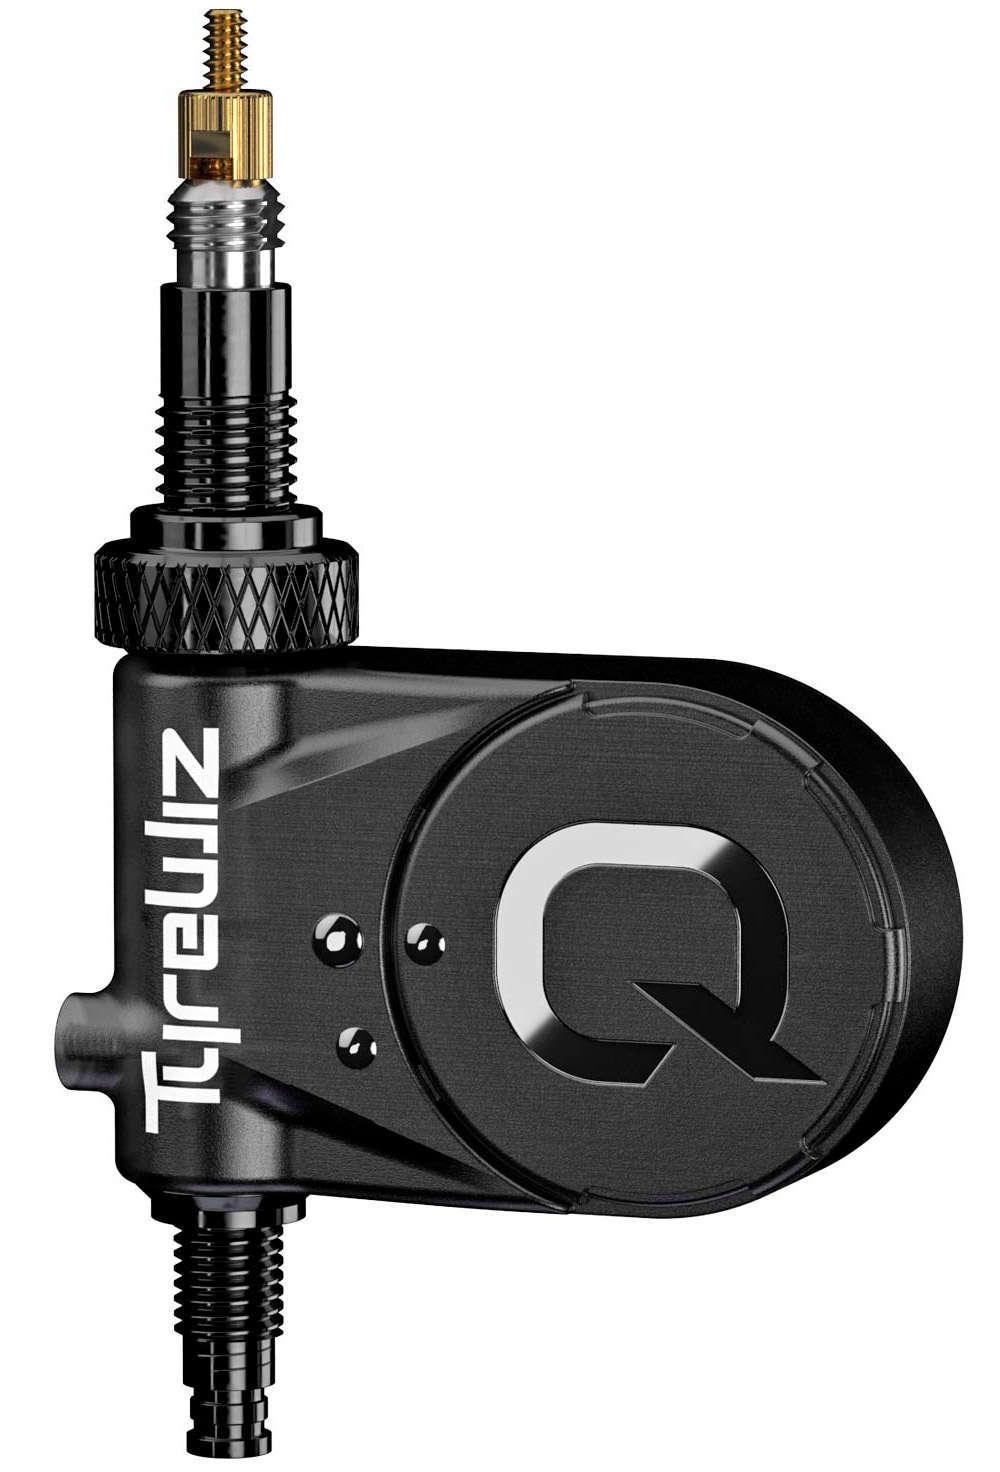 En TodoMountainBike: Quarq TyreWiz, el primer sensor de presión para neumáticos de bicicleta